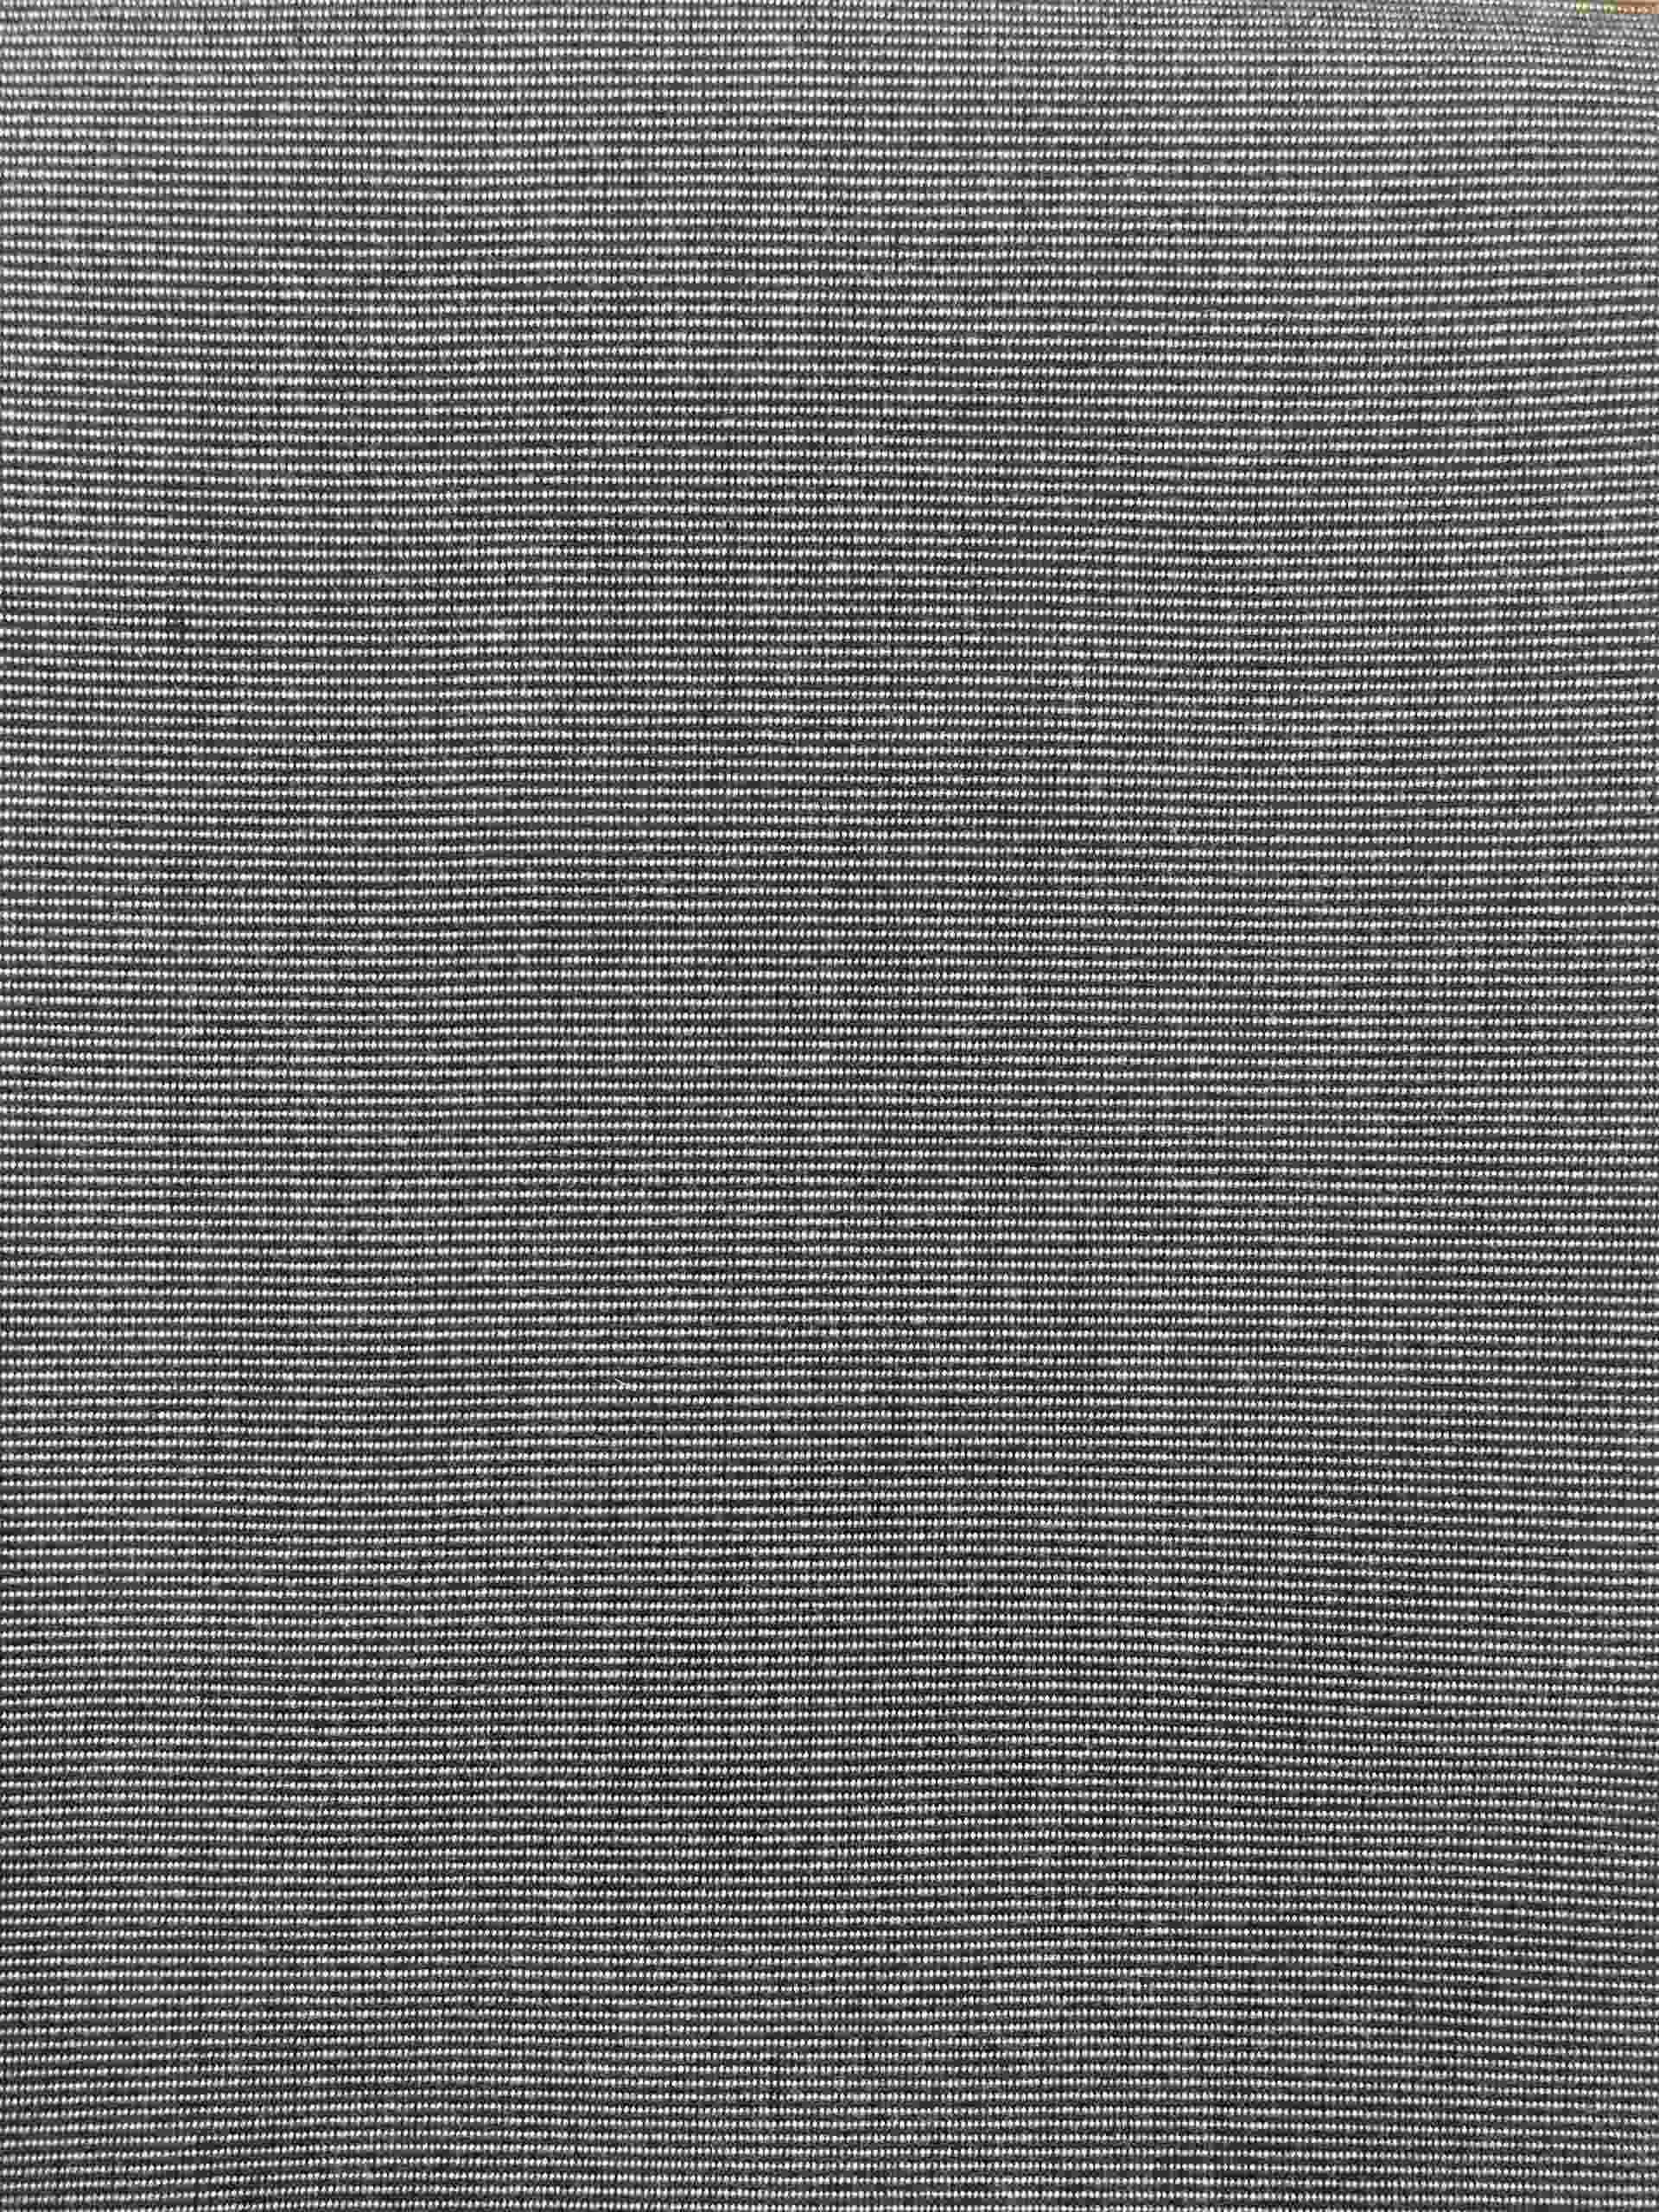 CHARCOAL 3705 KAT. 2